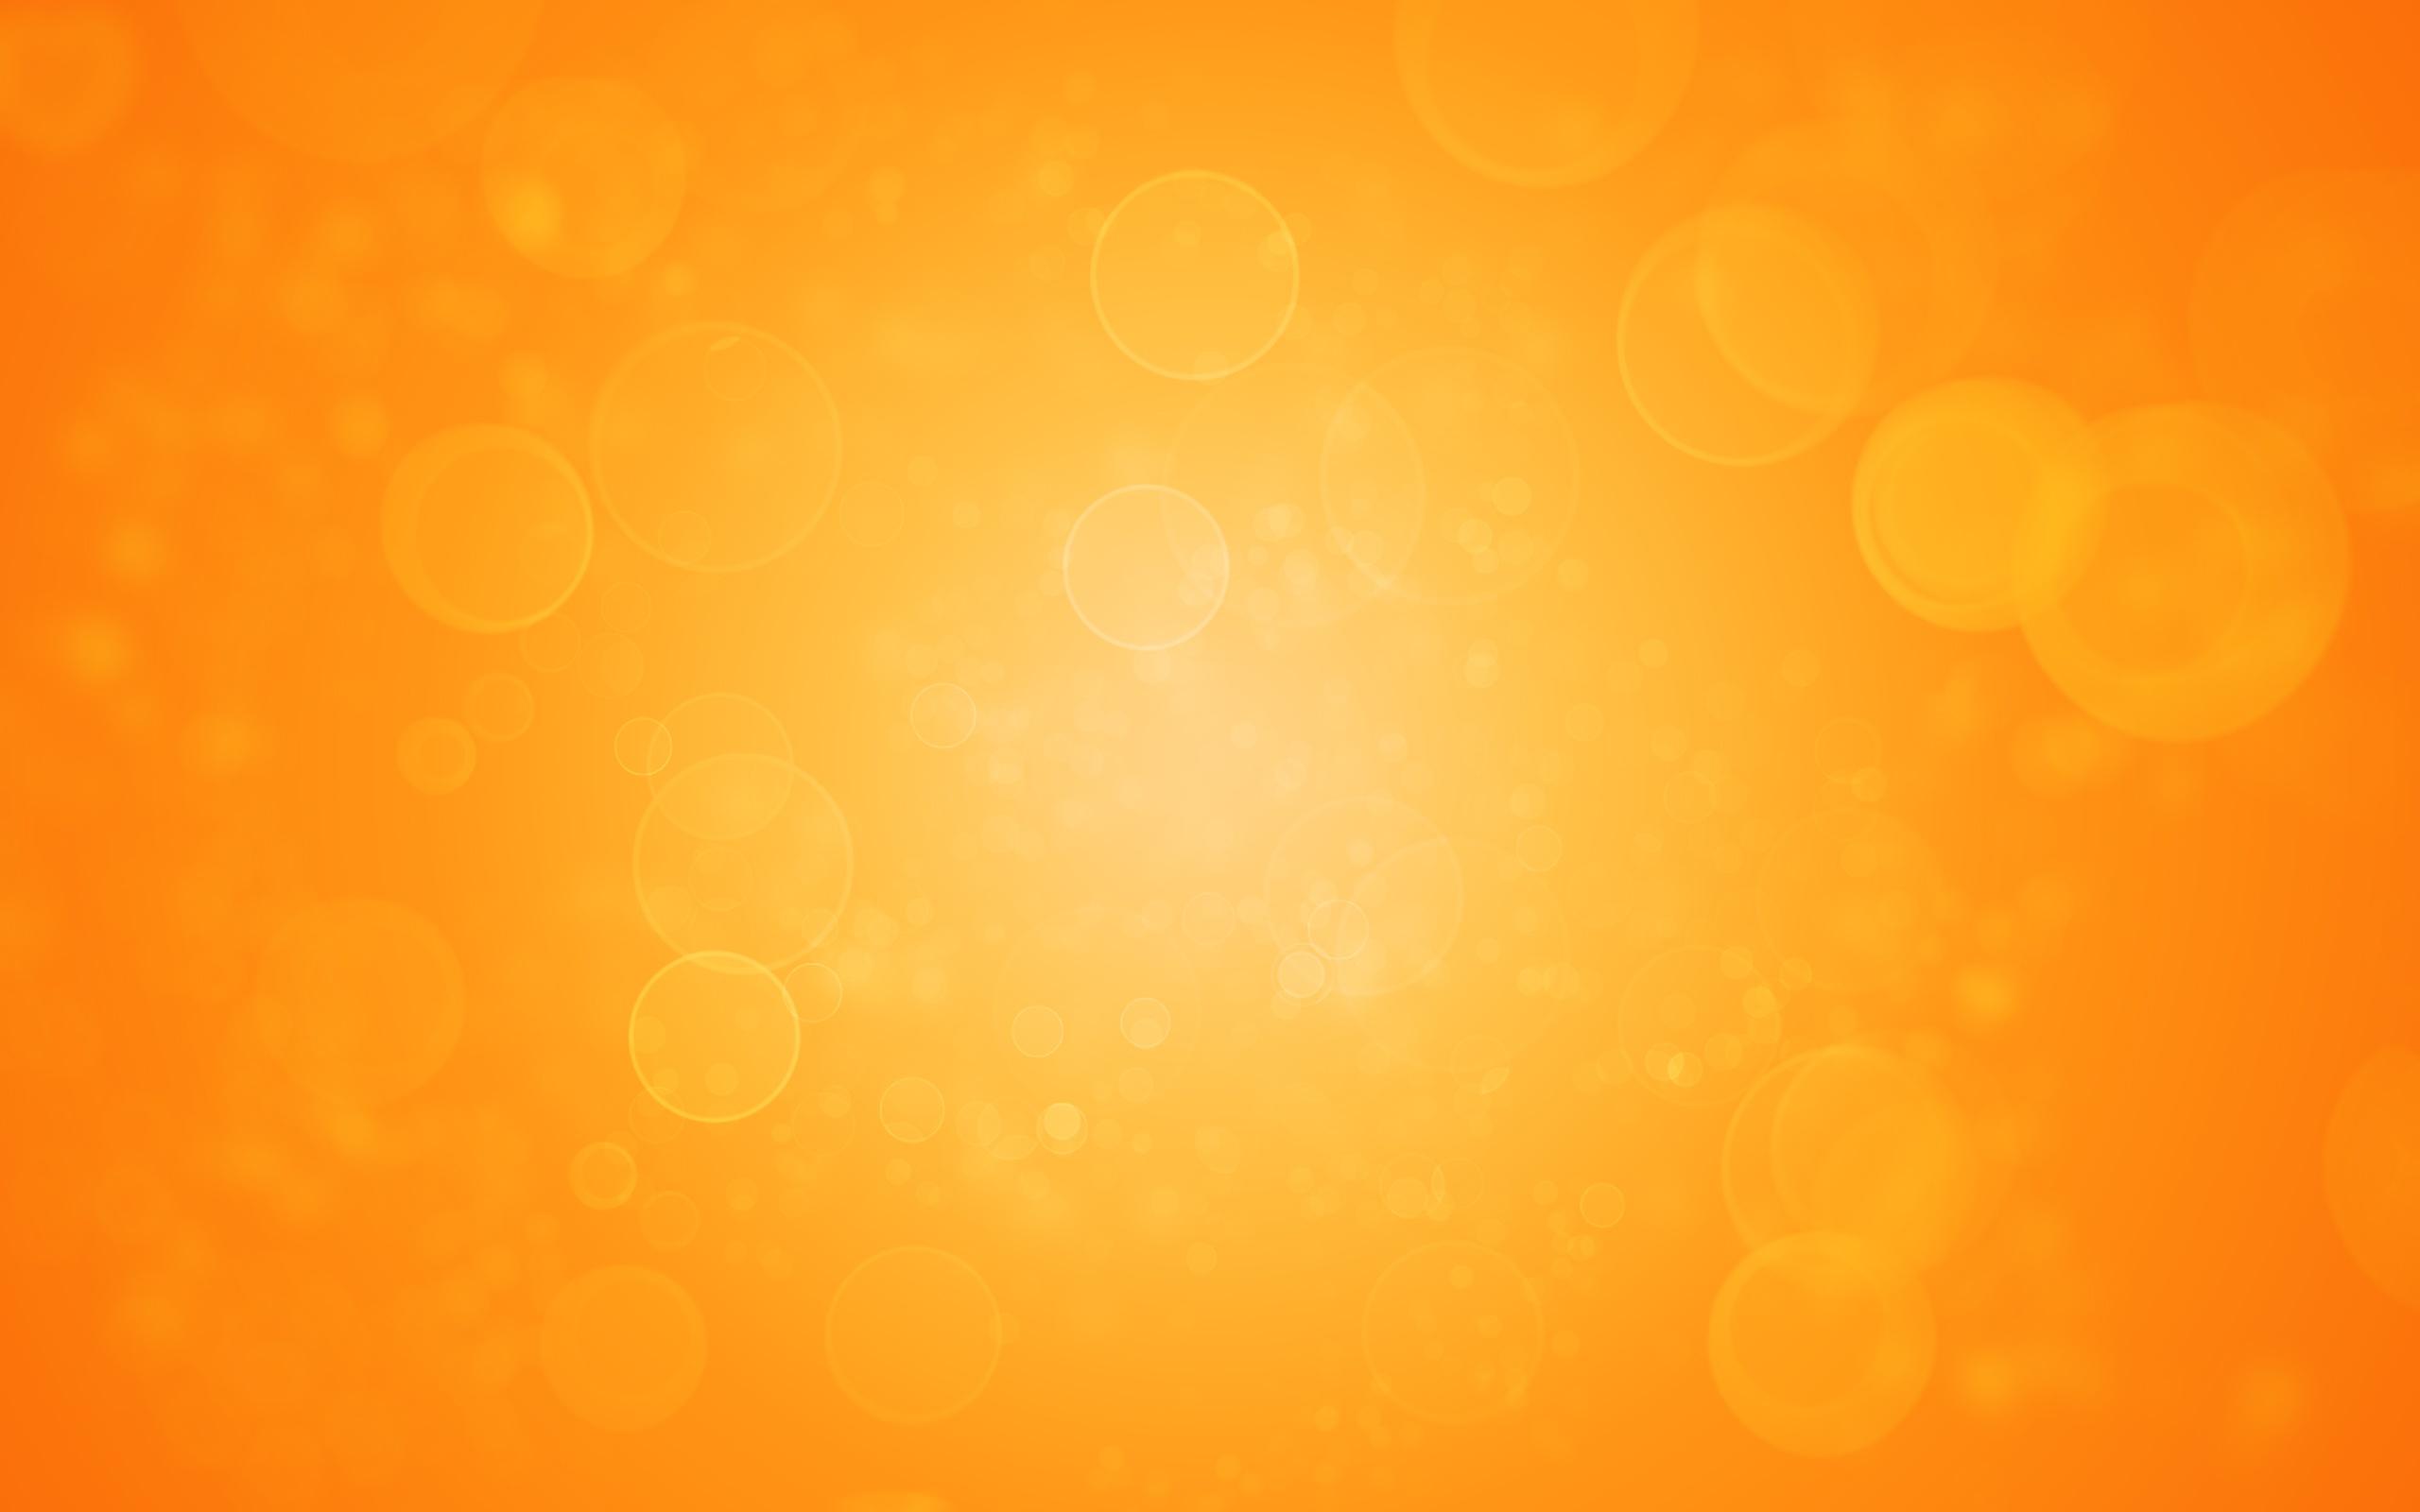 Yellow Abstract wallpaper 2560x1600 57954